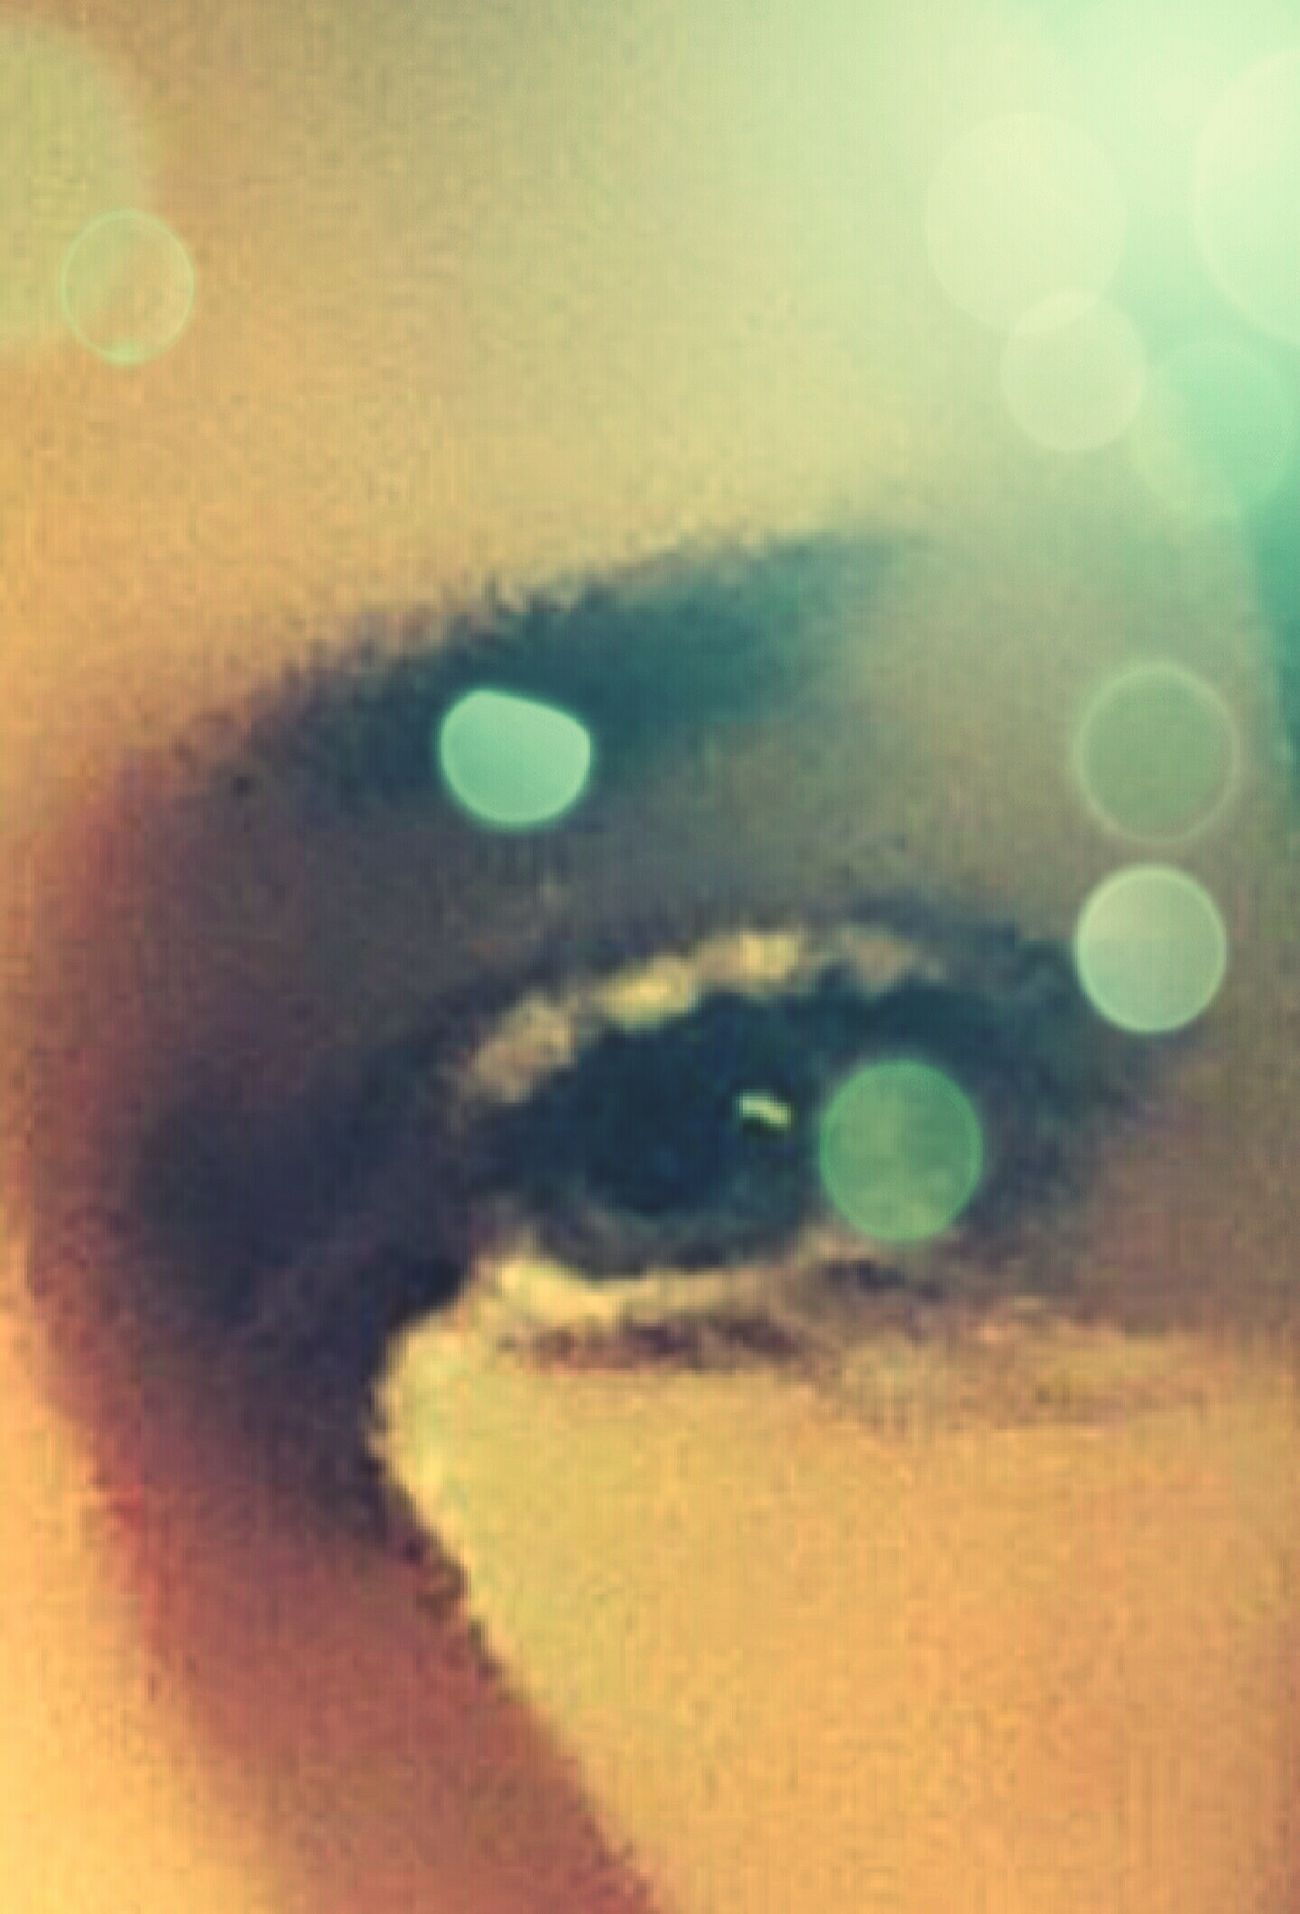 Hello World EyeEm Best Shots Eyeemphotography Single Object Beautiful Looking To The Other Side Doyoulikeit? Lookatme Seductive Creative Light And Shadow Dynamic CreativePhotographer MyCrazyBeautifulLife MyWorld ♡ Thatlook Cometorome Power In Nature